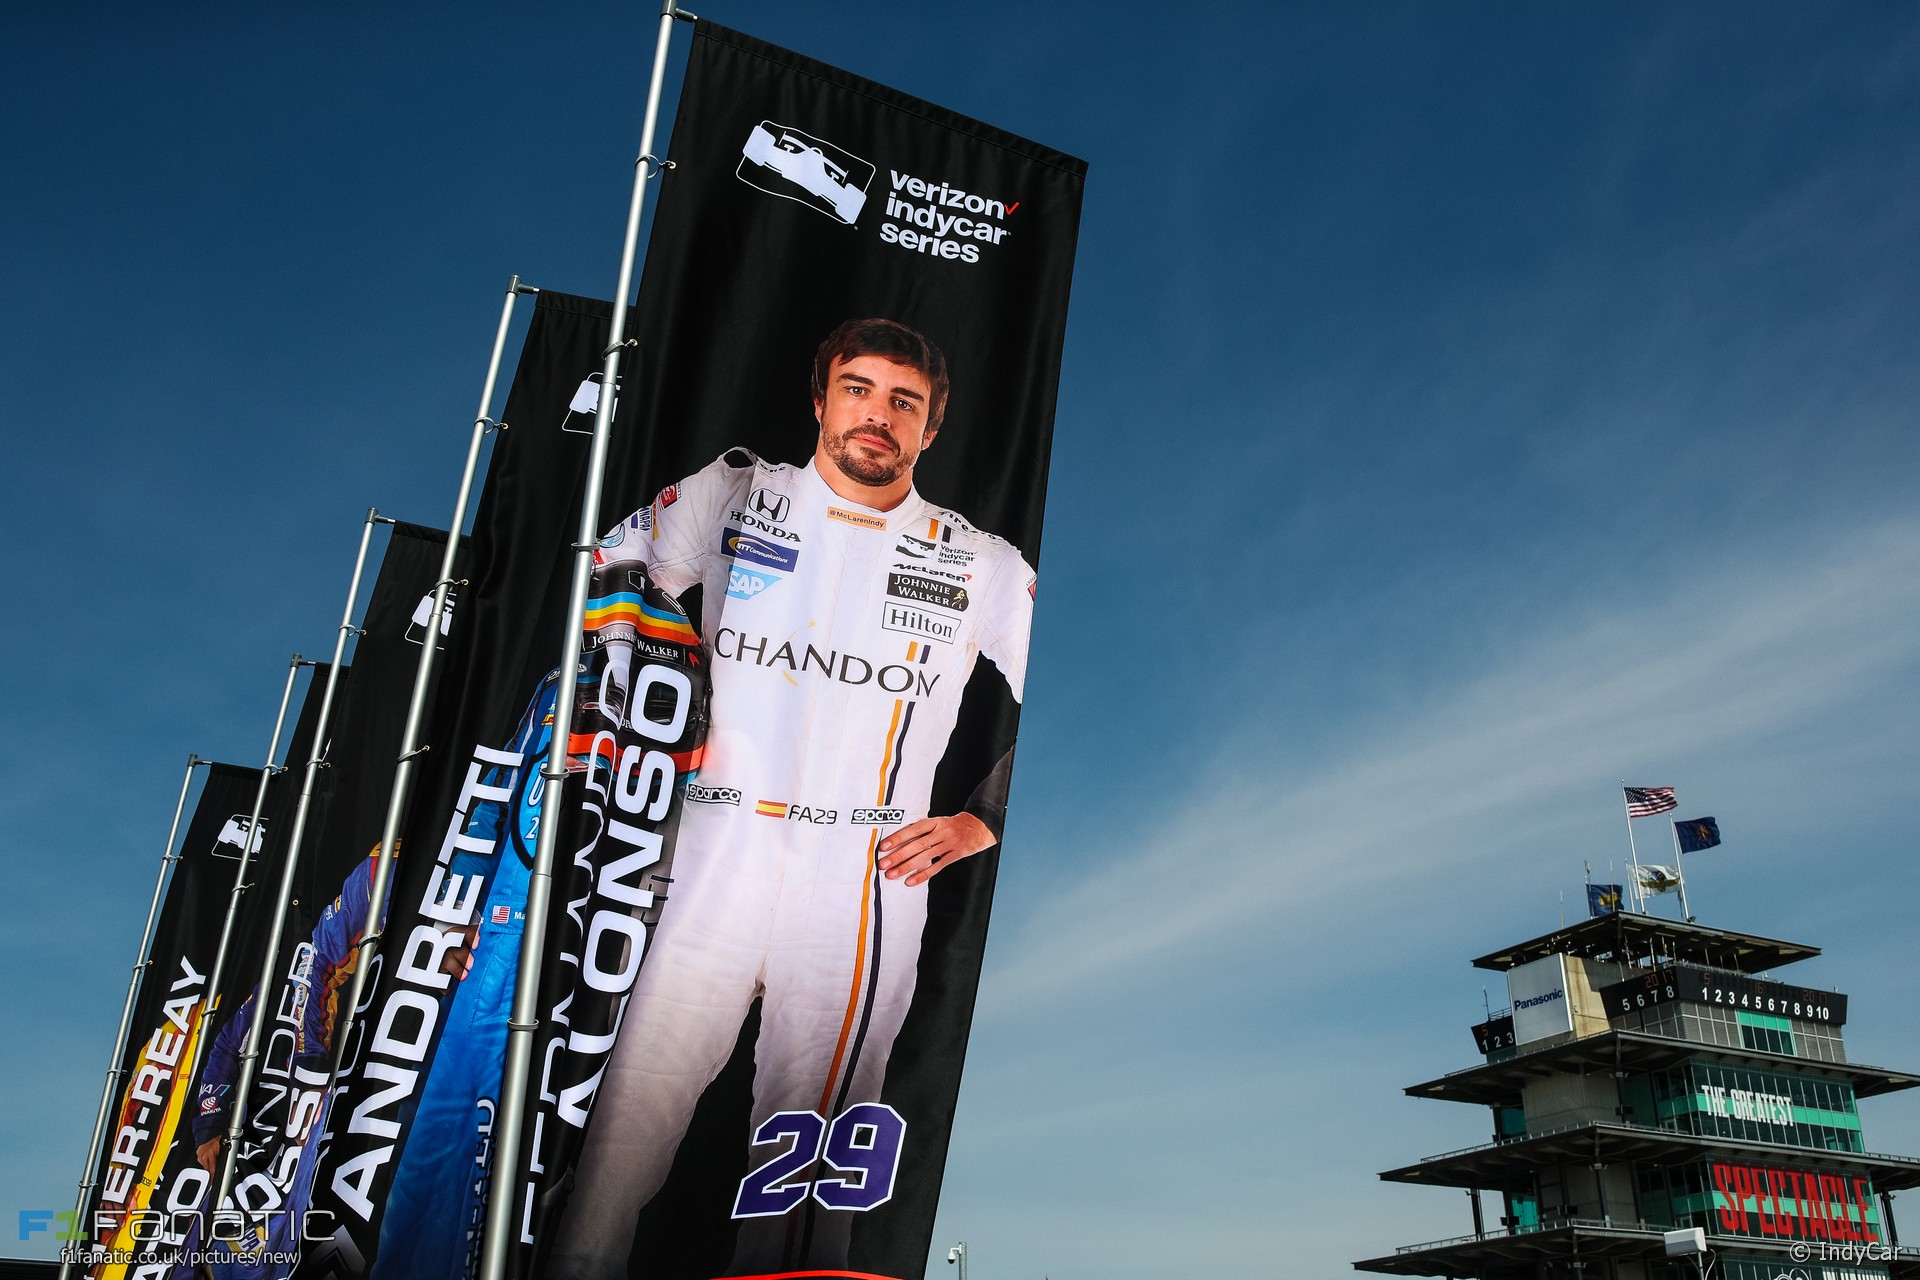 Fernando Alonso billboard, McLaren Andretti, IndyCar, Indianapolis Motor Speedway, 2017